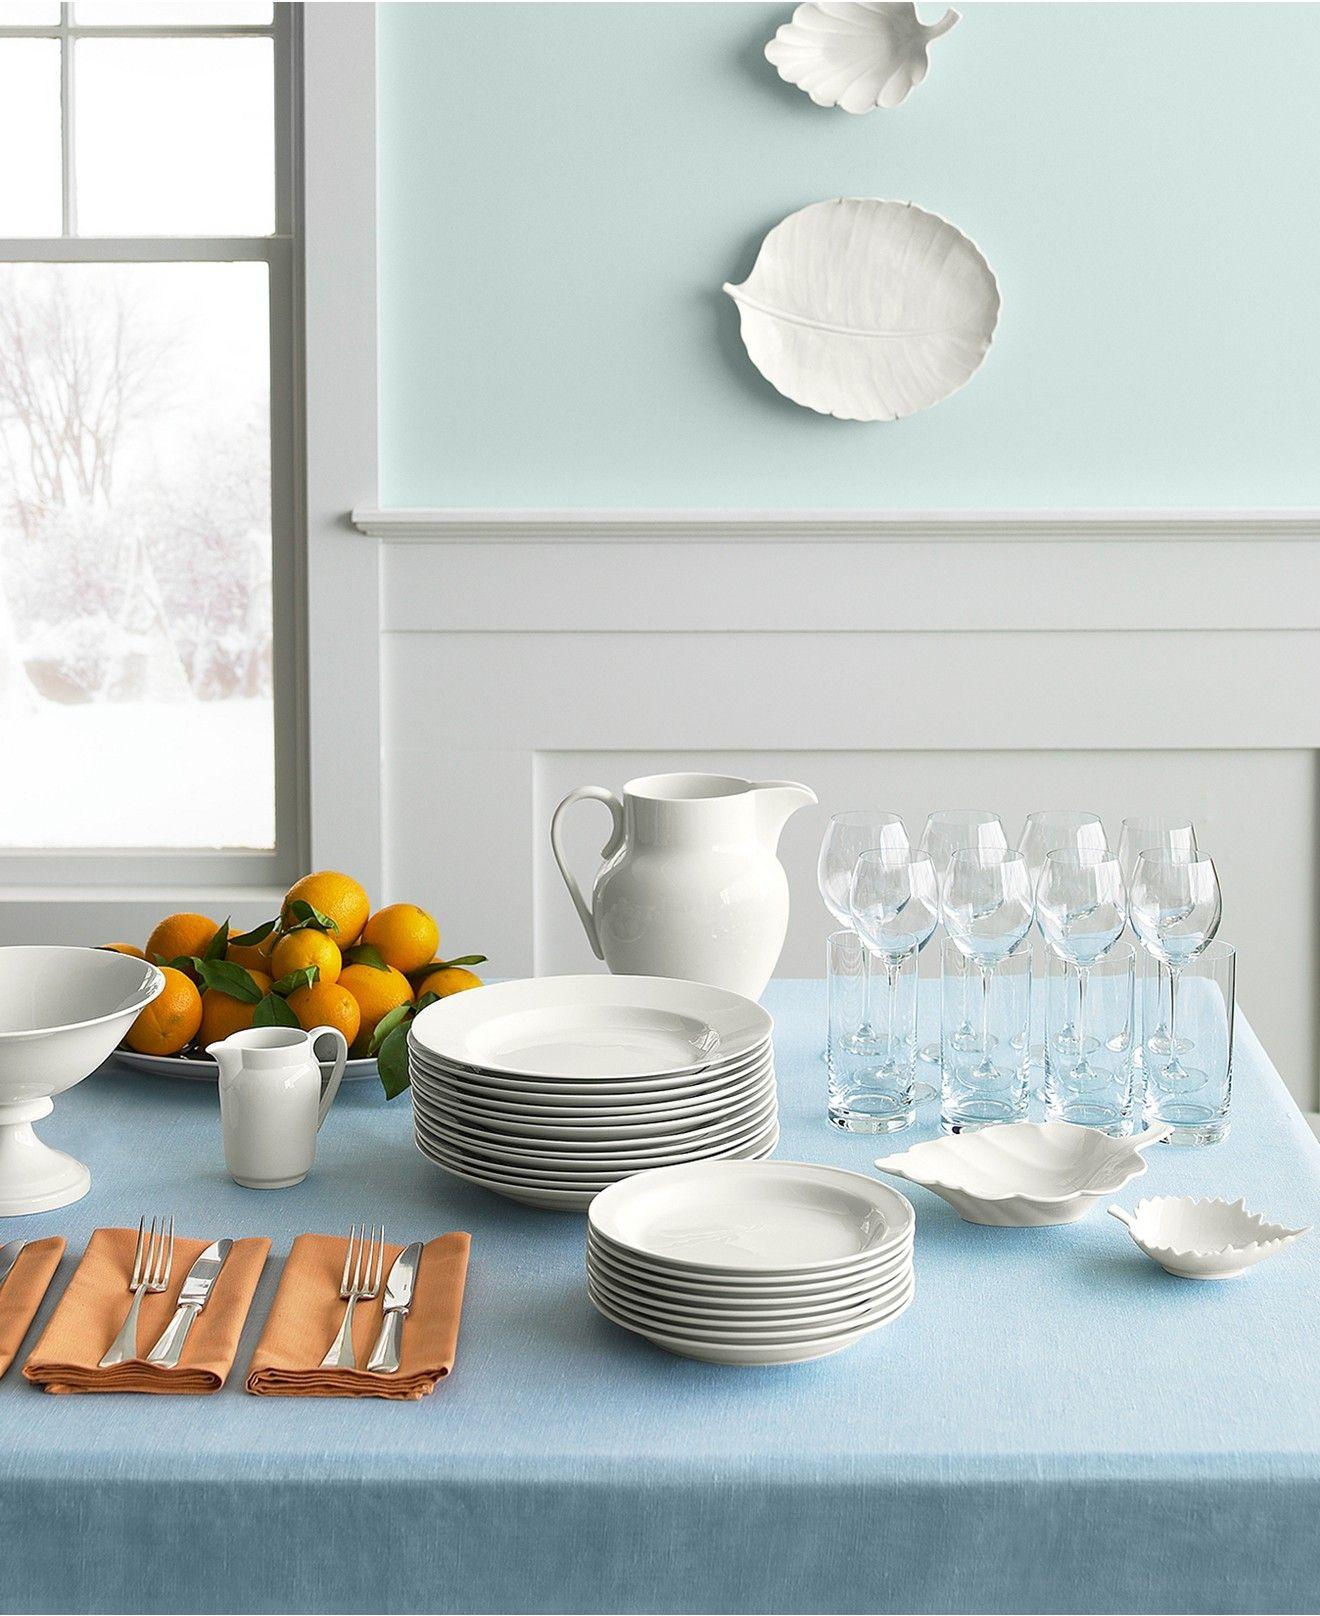 Martha Stewart Collection Kensington Whiteware Collection. Casual DinnerwareWhite ... & Martha Stewart Collection Kensington Whiteware Collection   Martha ...